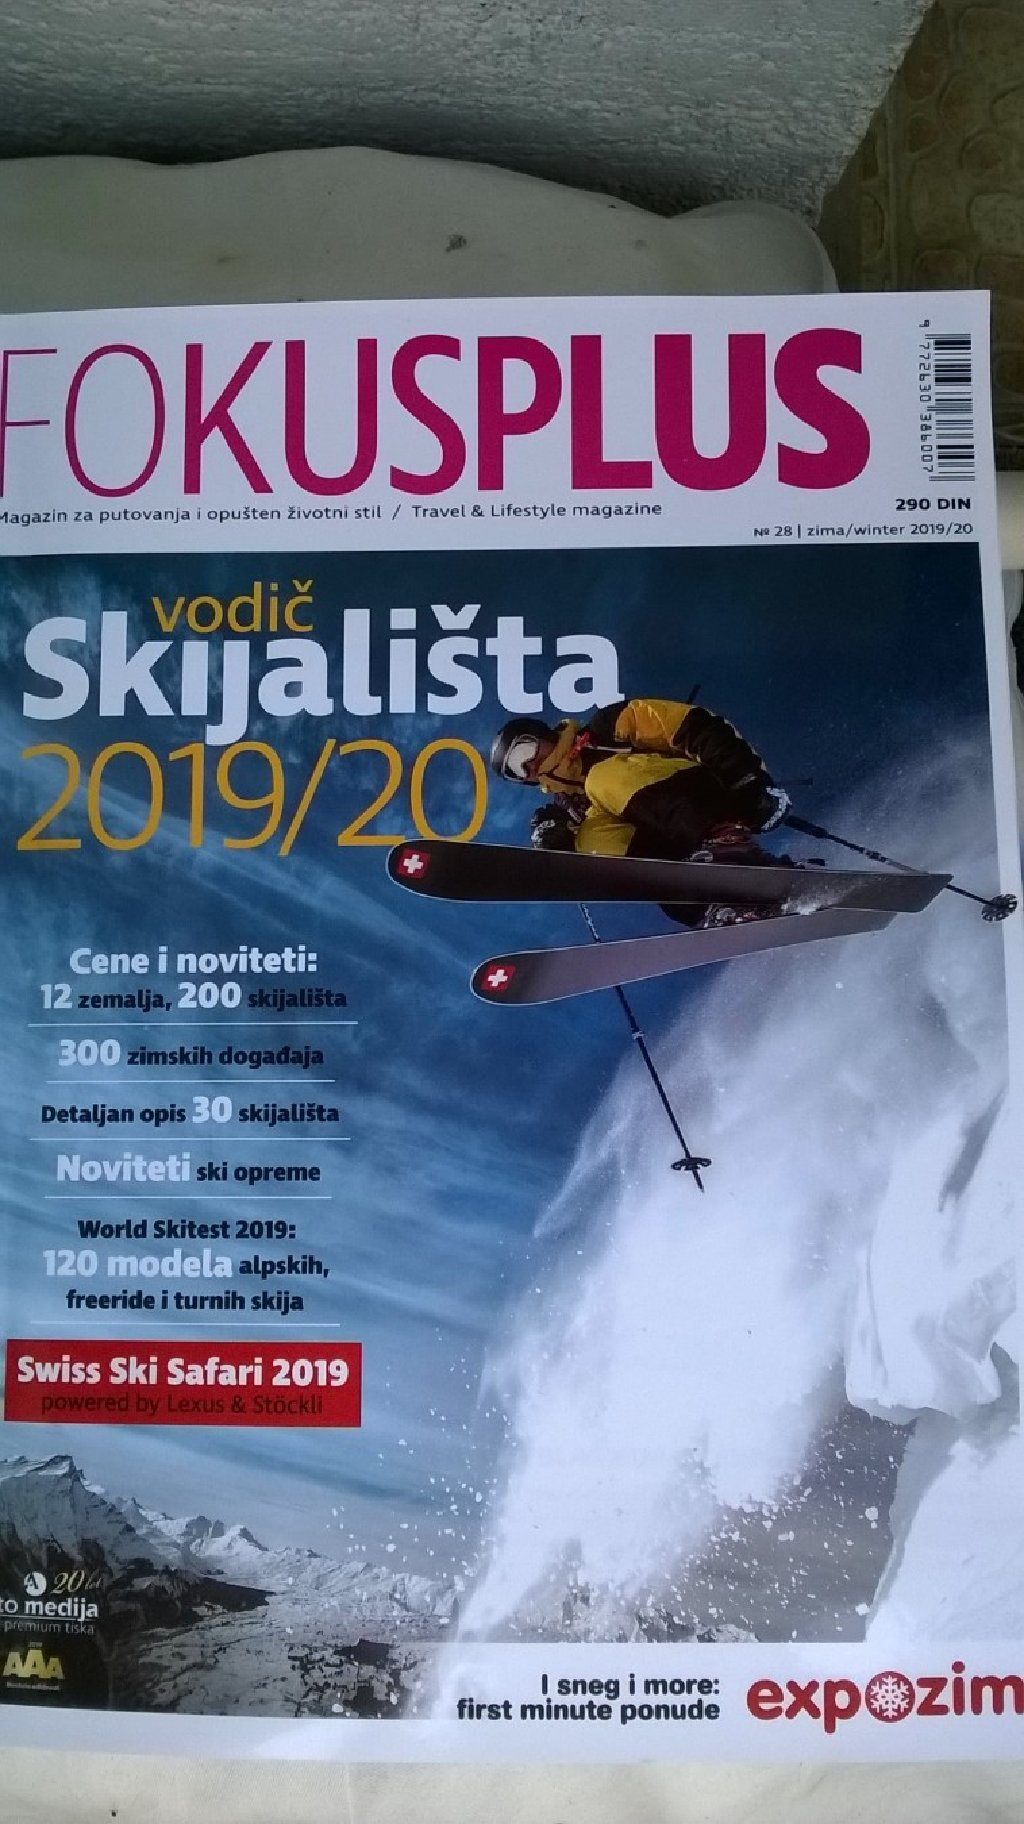 Casopis Fokusplus No.28, zima 2019 2020. nov